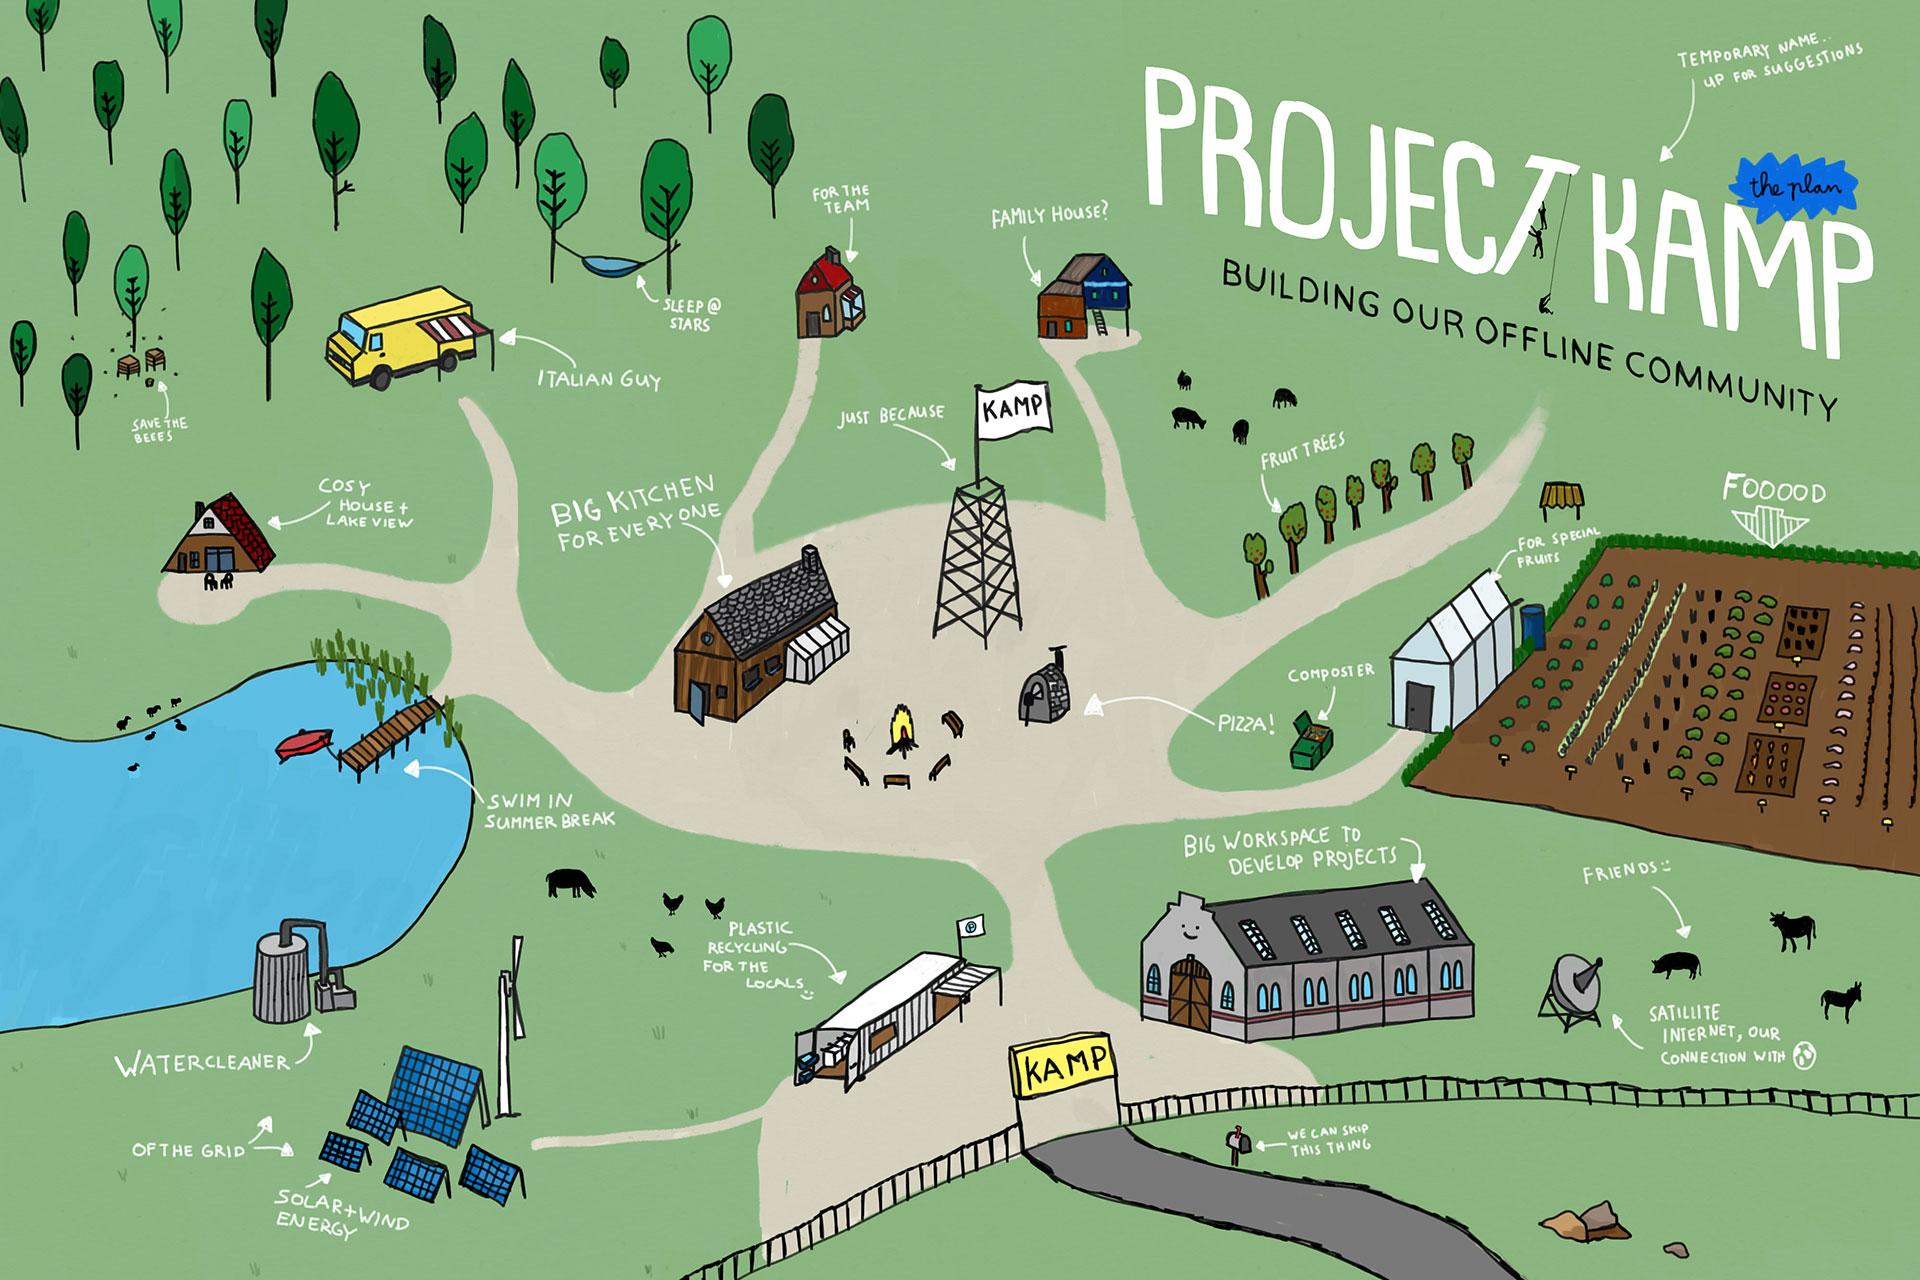 Project Kamp drawing